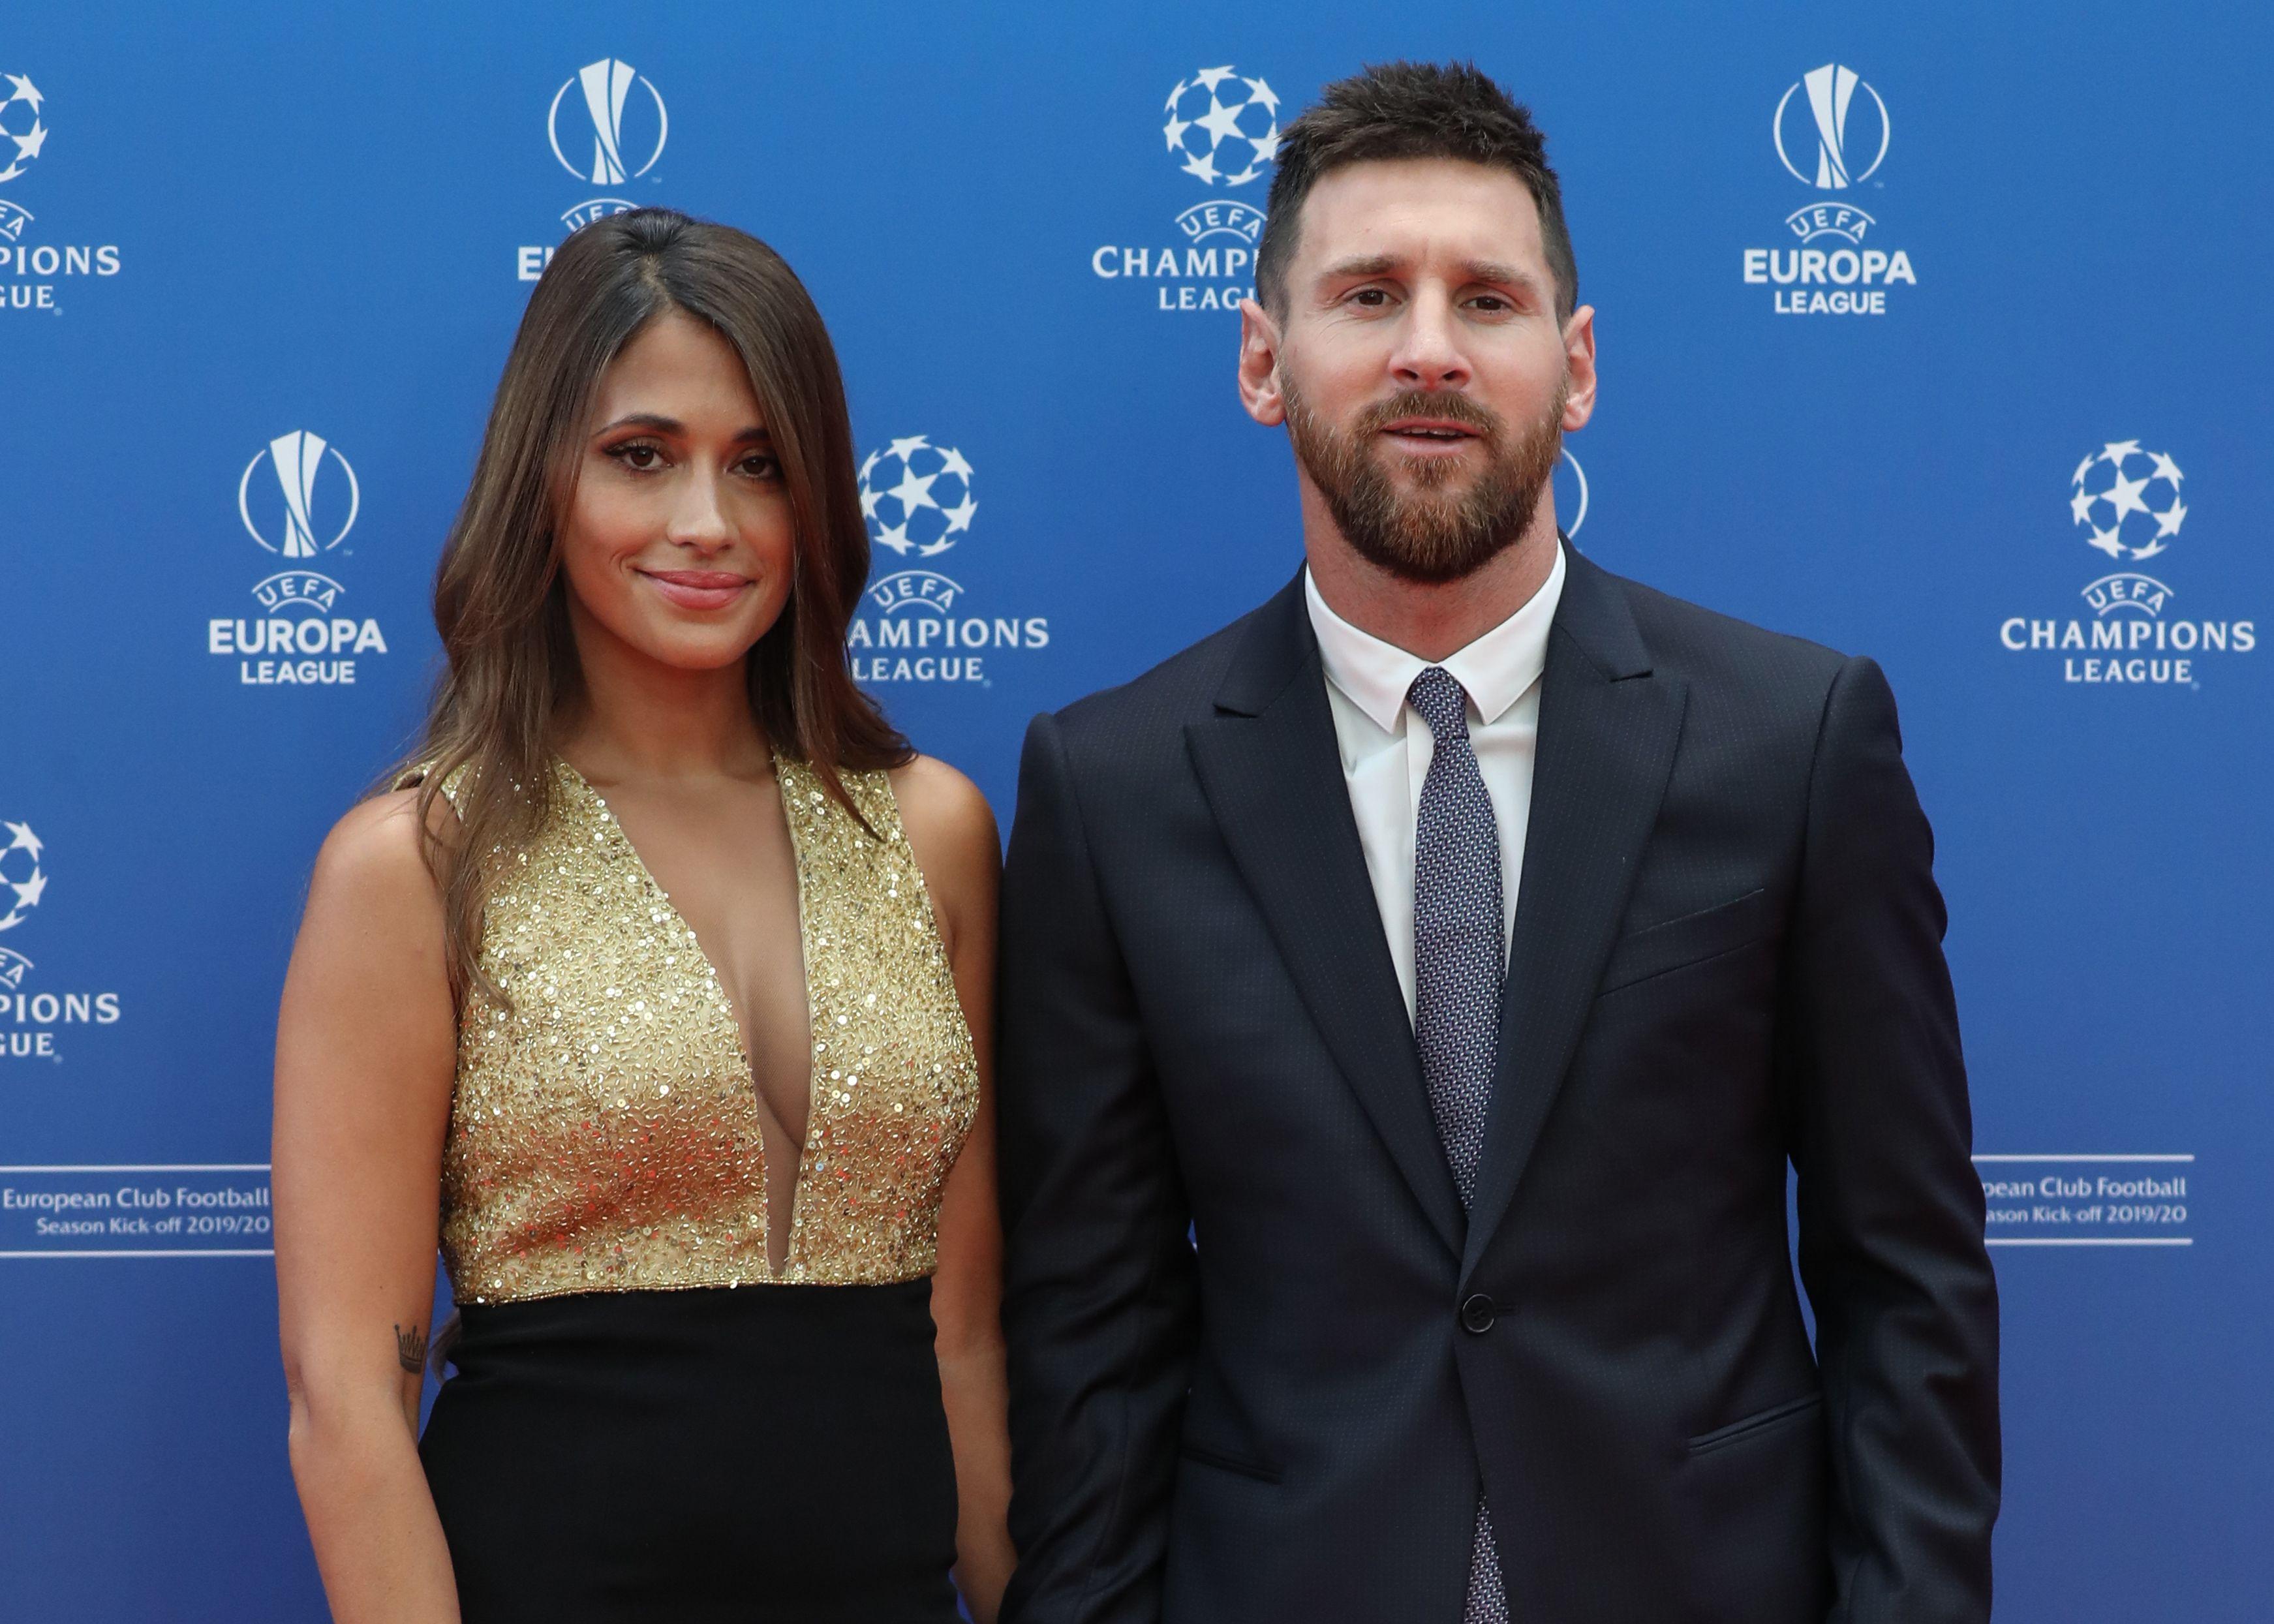 Messi Antonella Premios UEFA Sorteo Champions League